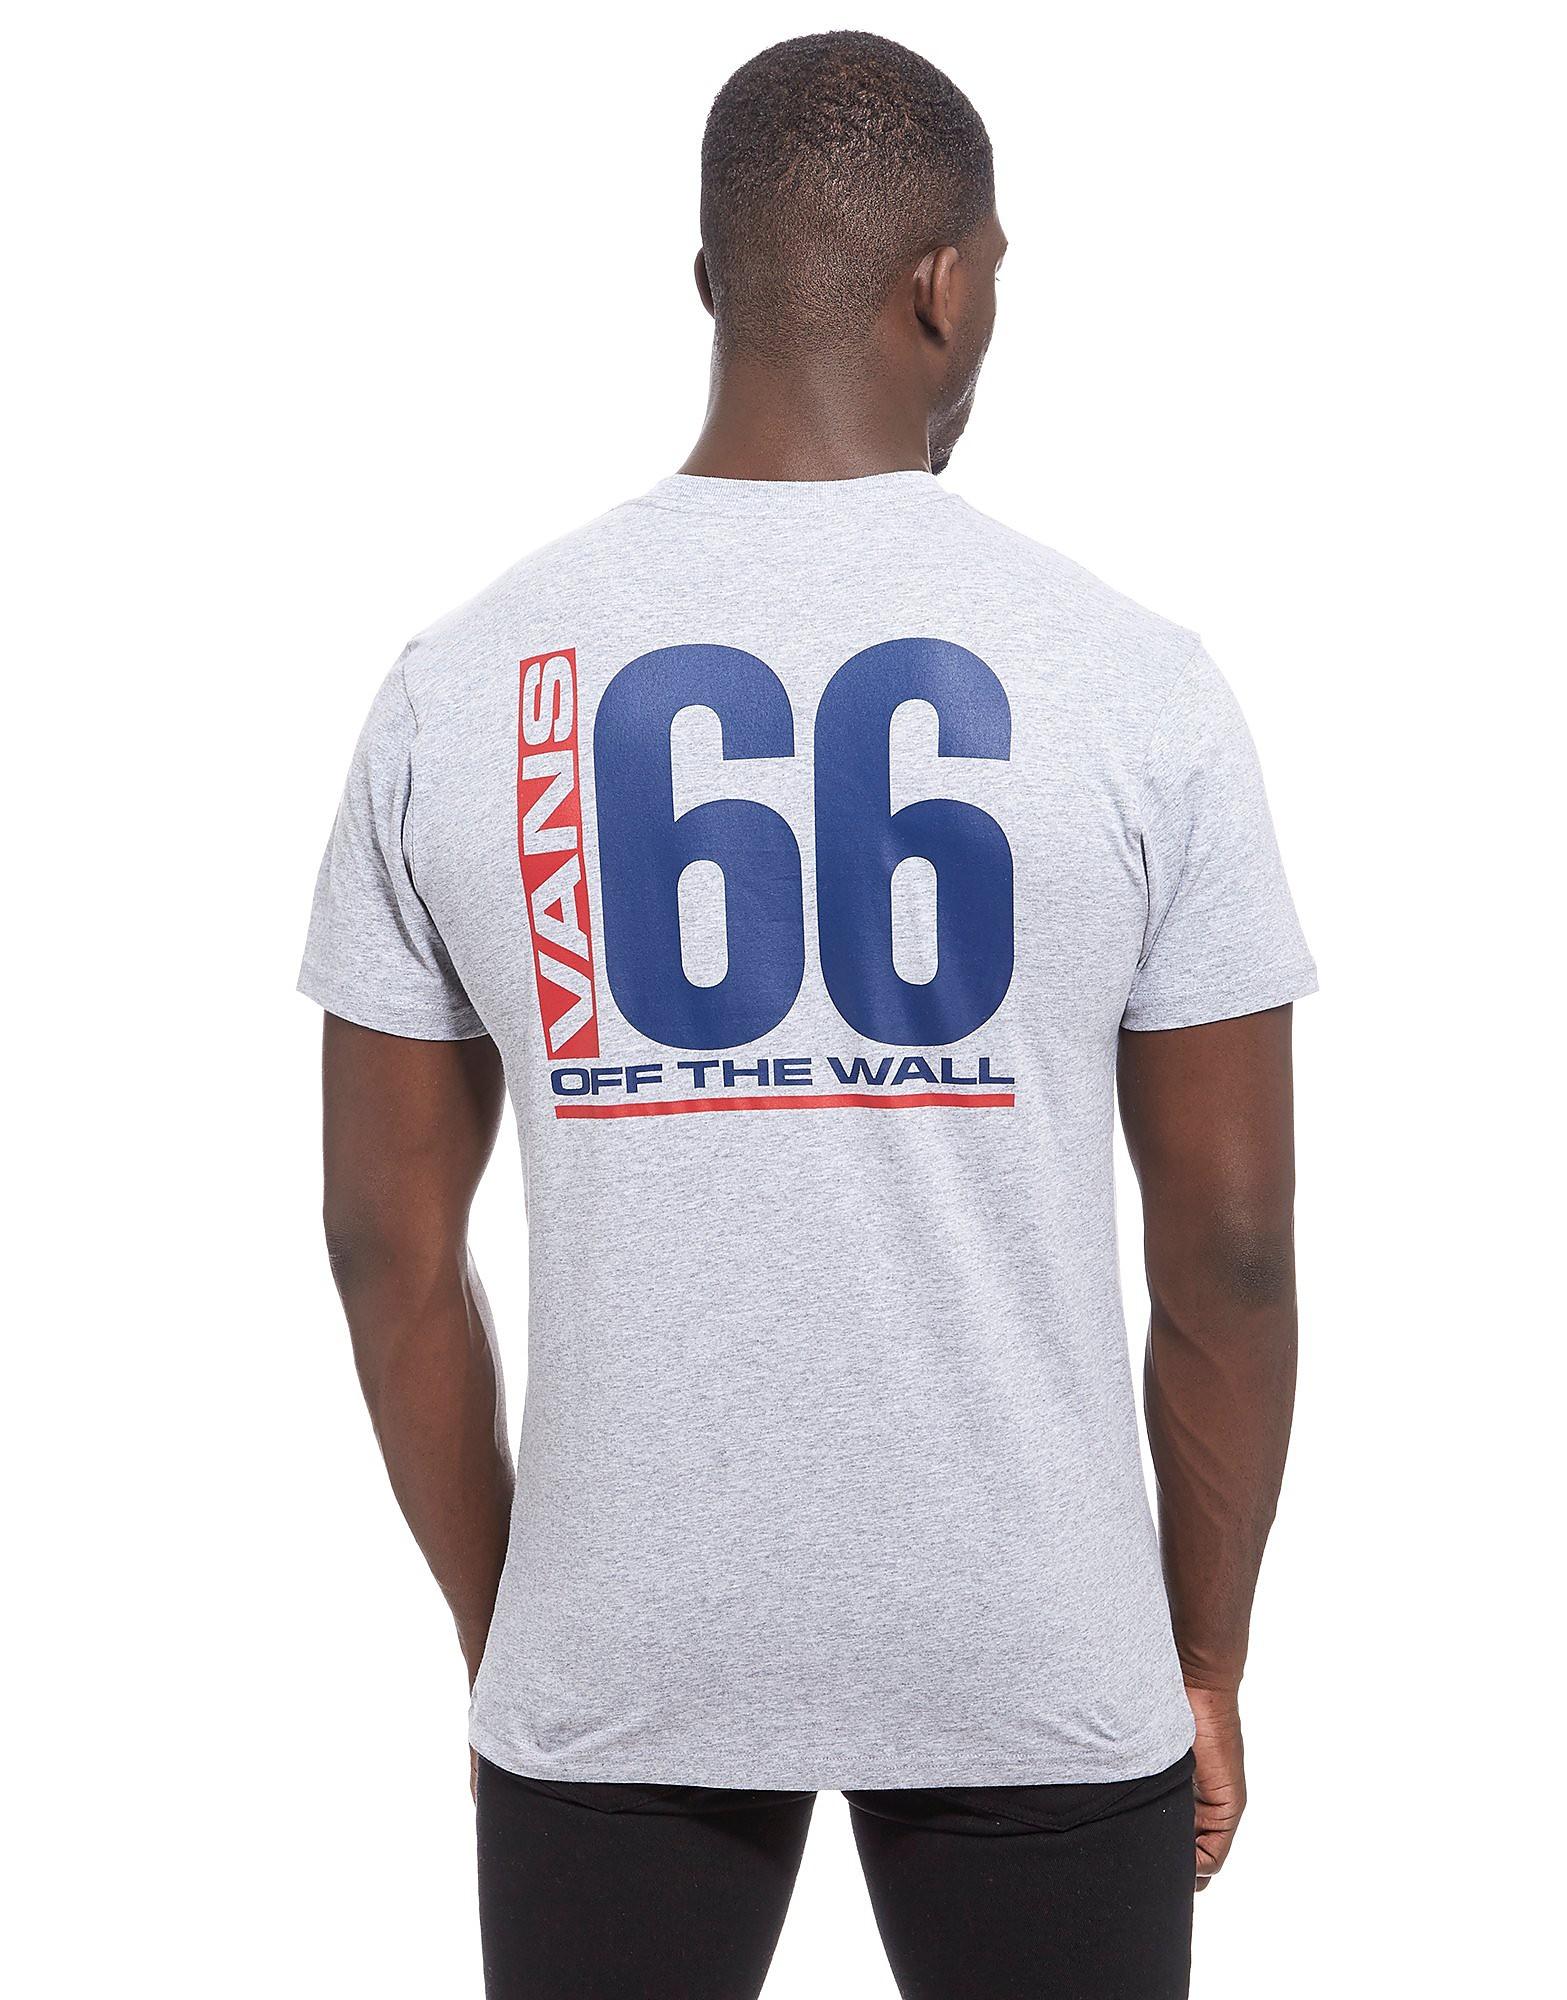 Vans Retro Box T-Shirt